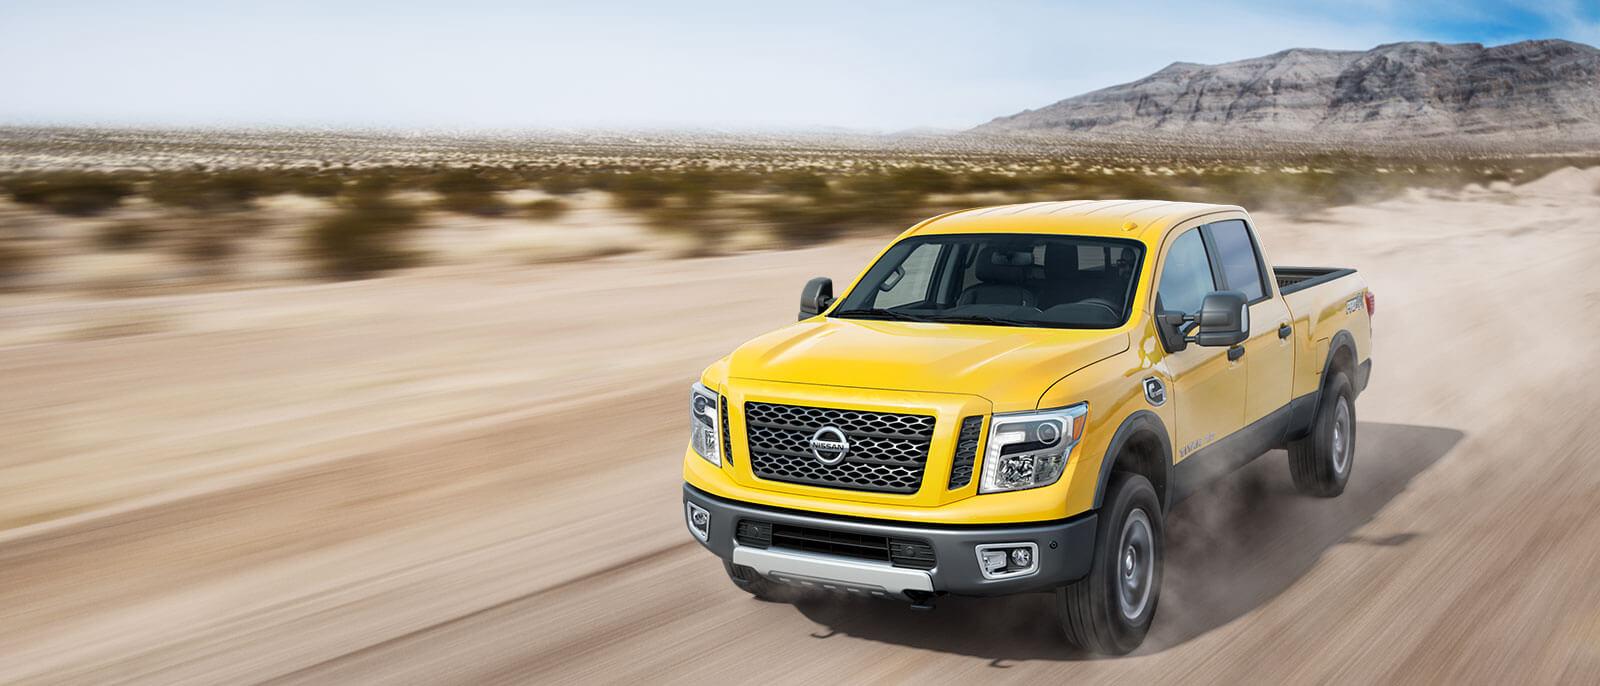 2017 Nissan Titan on the desert highway